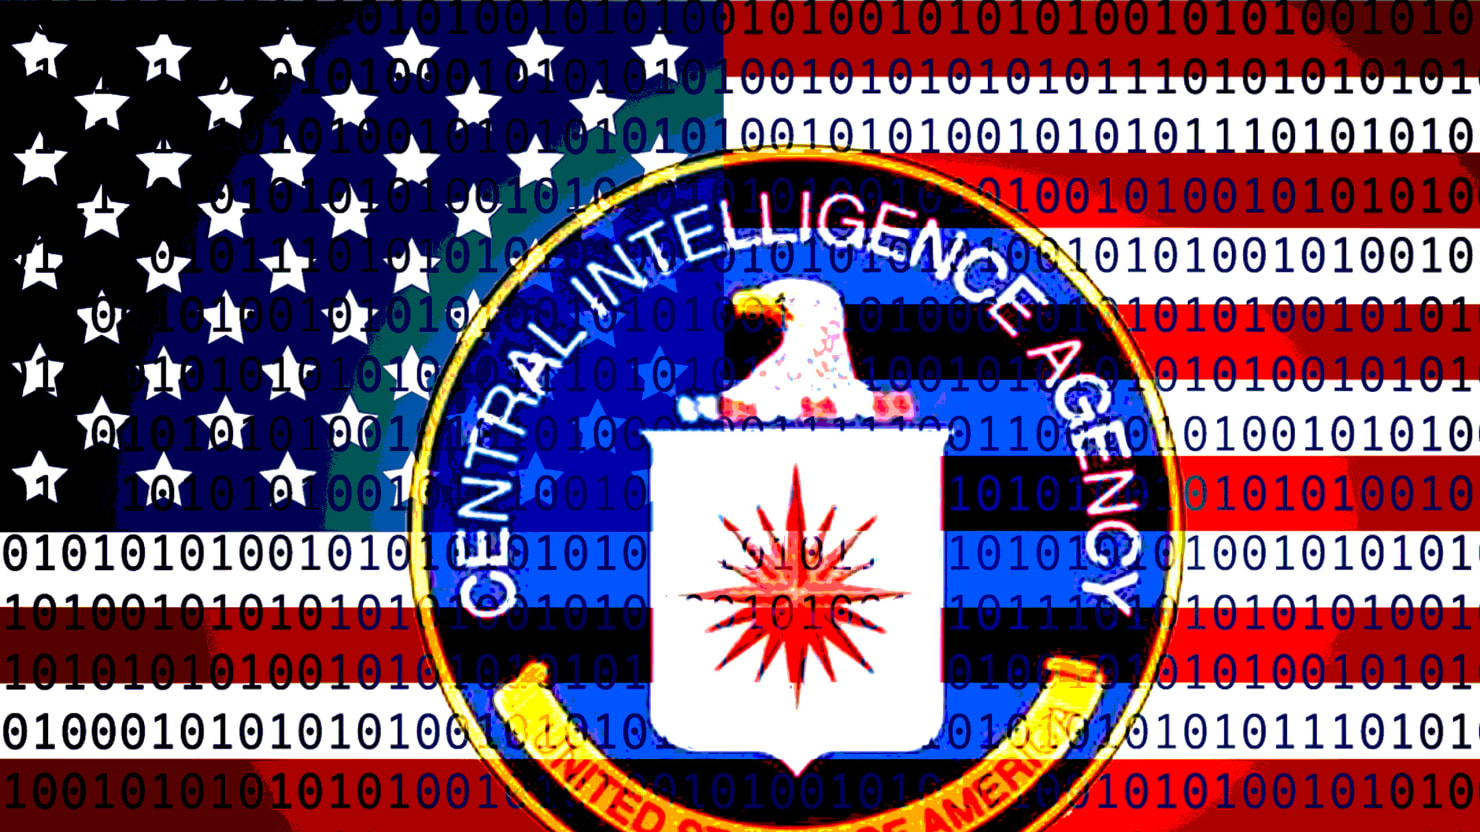 Russia Turns Wikileaks Cia Dump Into Disinformation